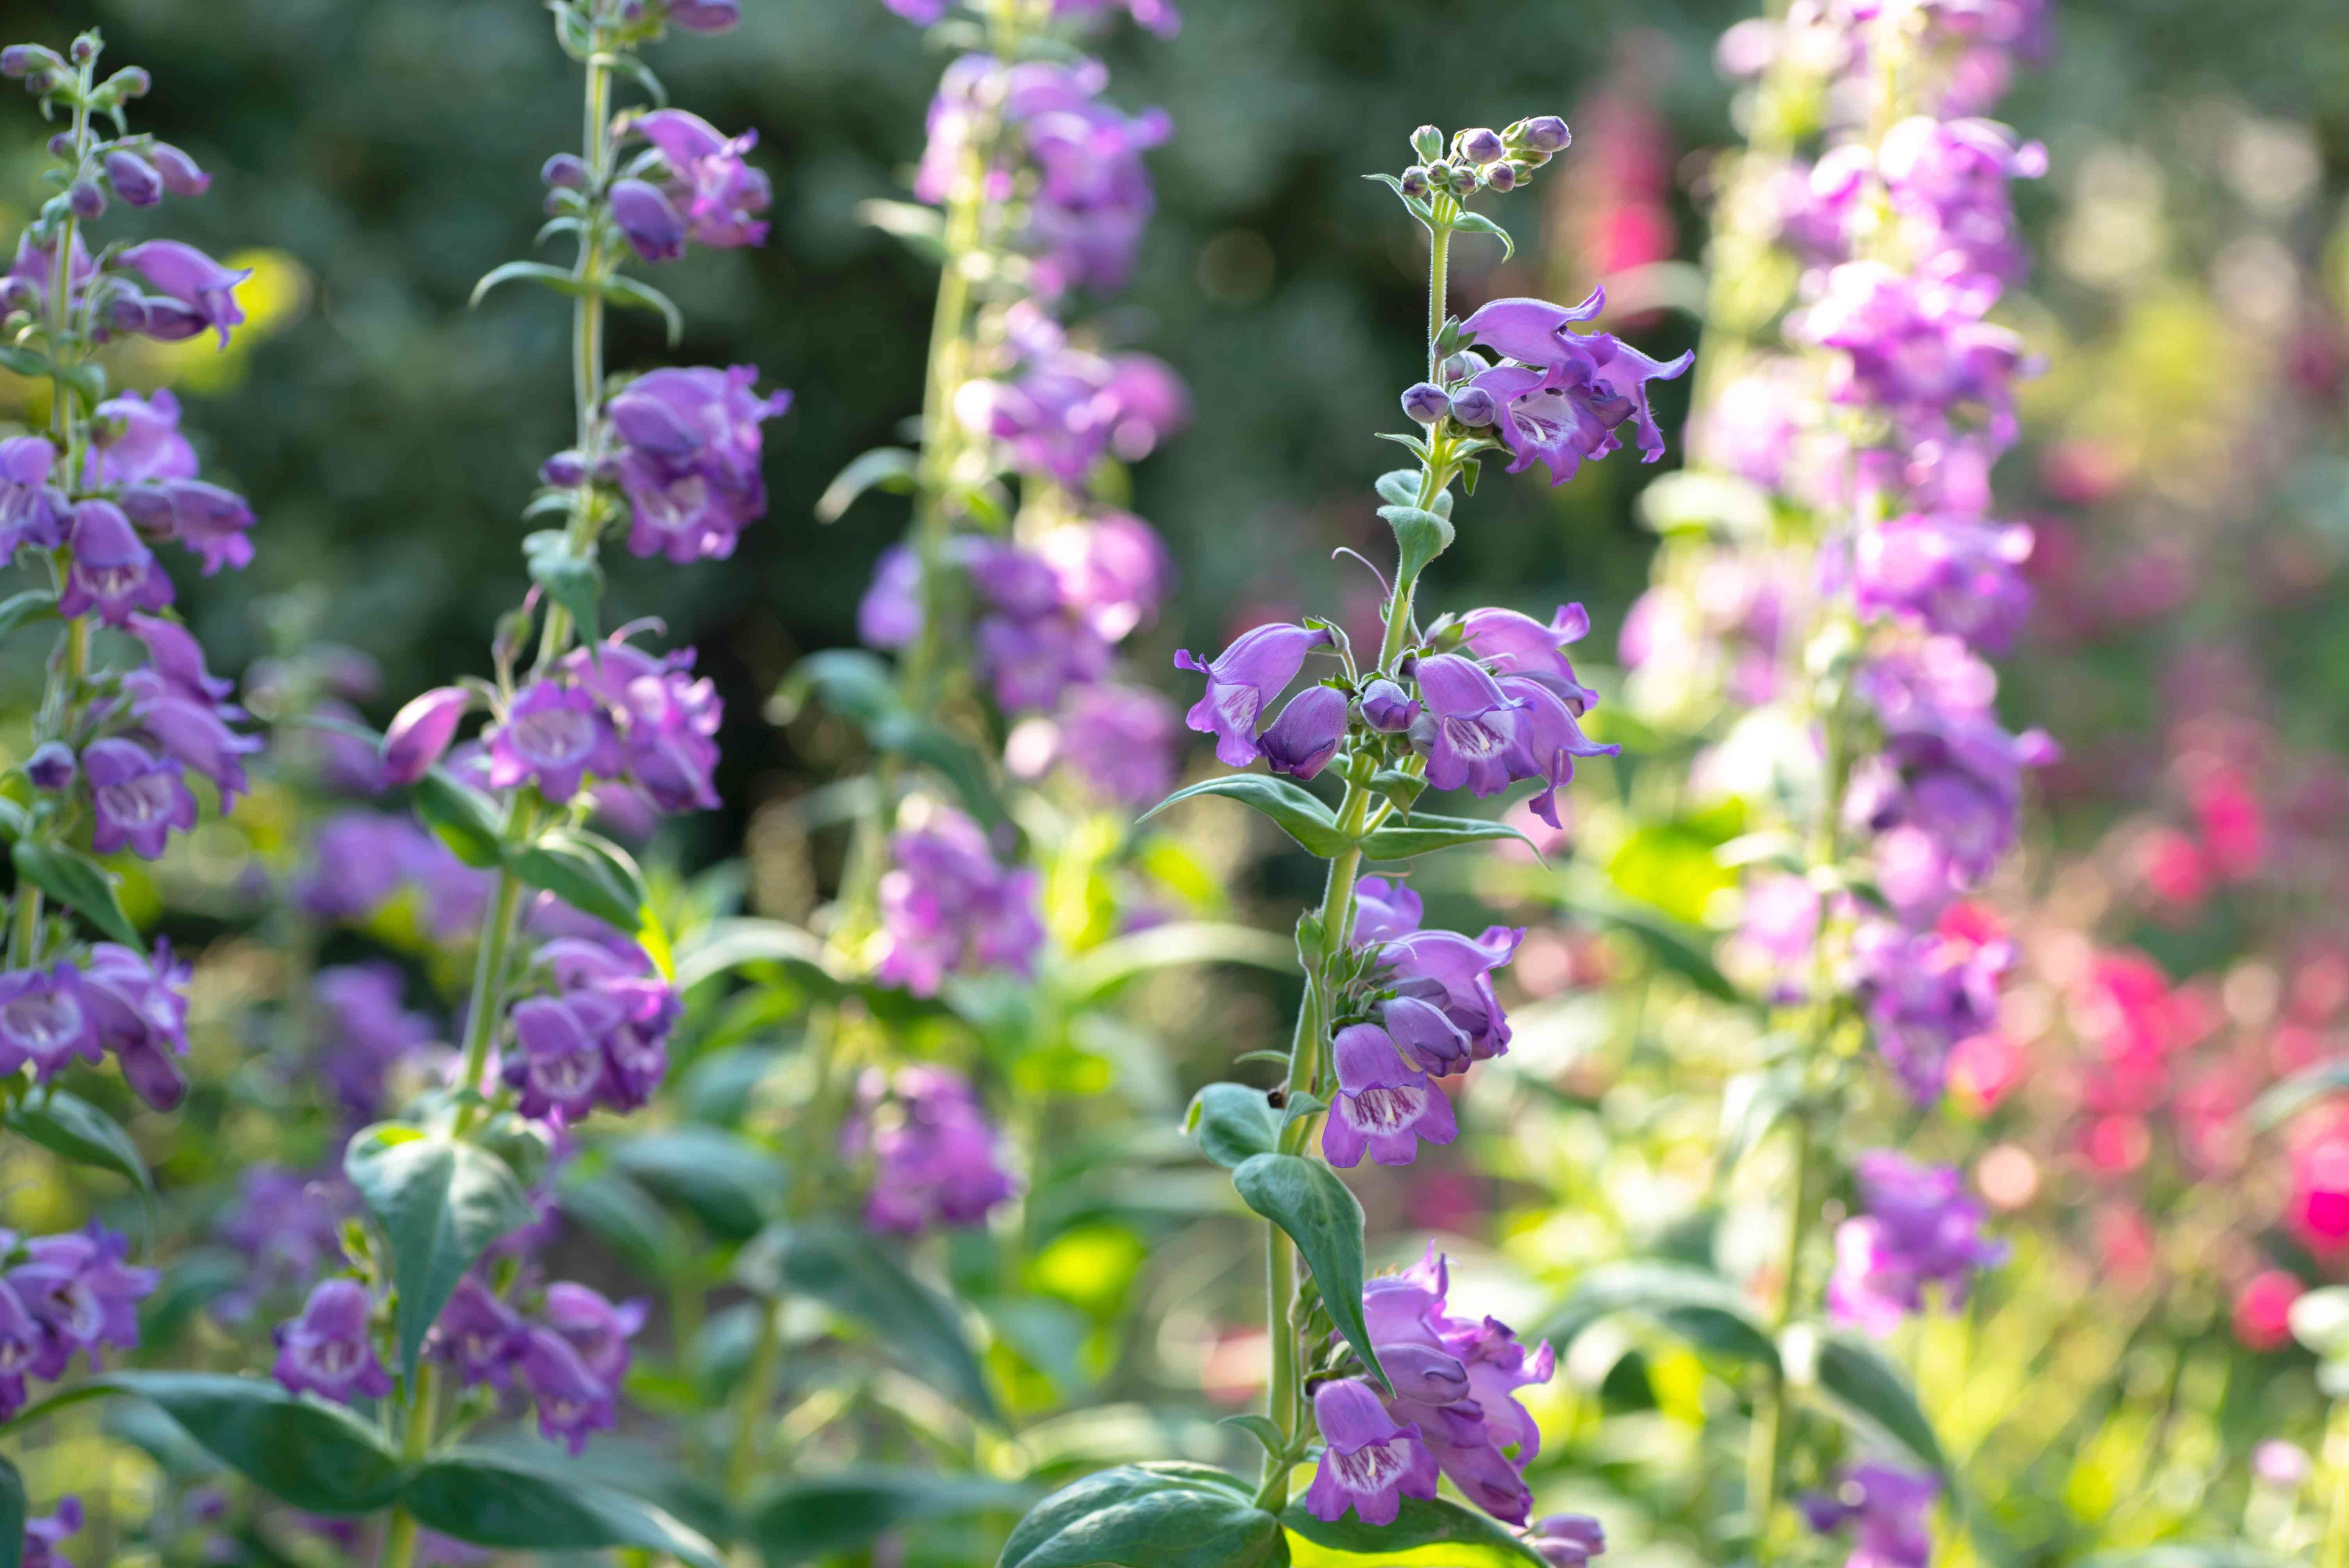 Beardtongue stems with purple flowers